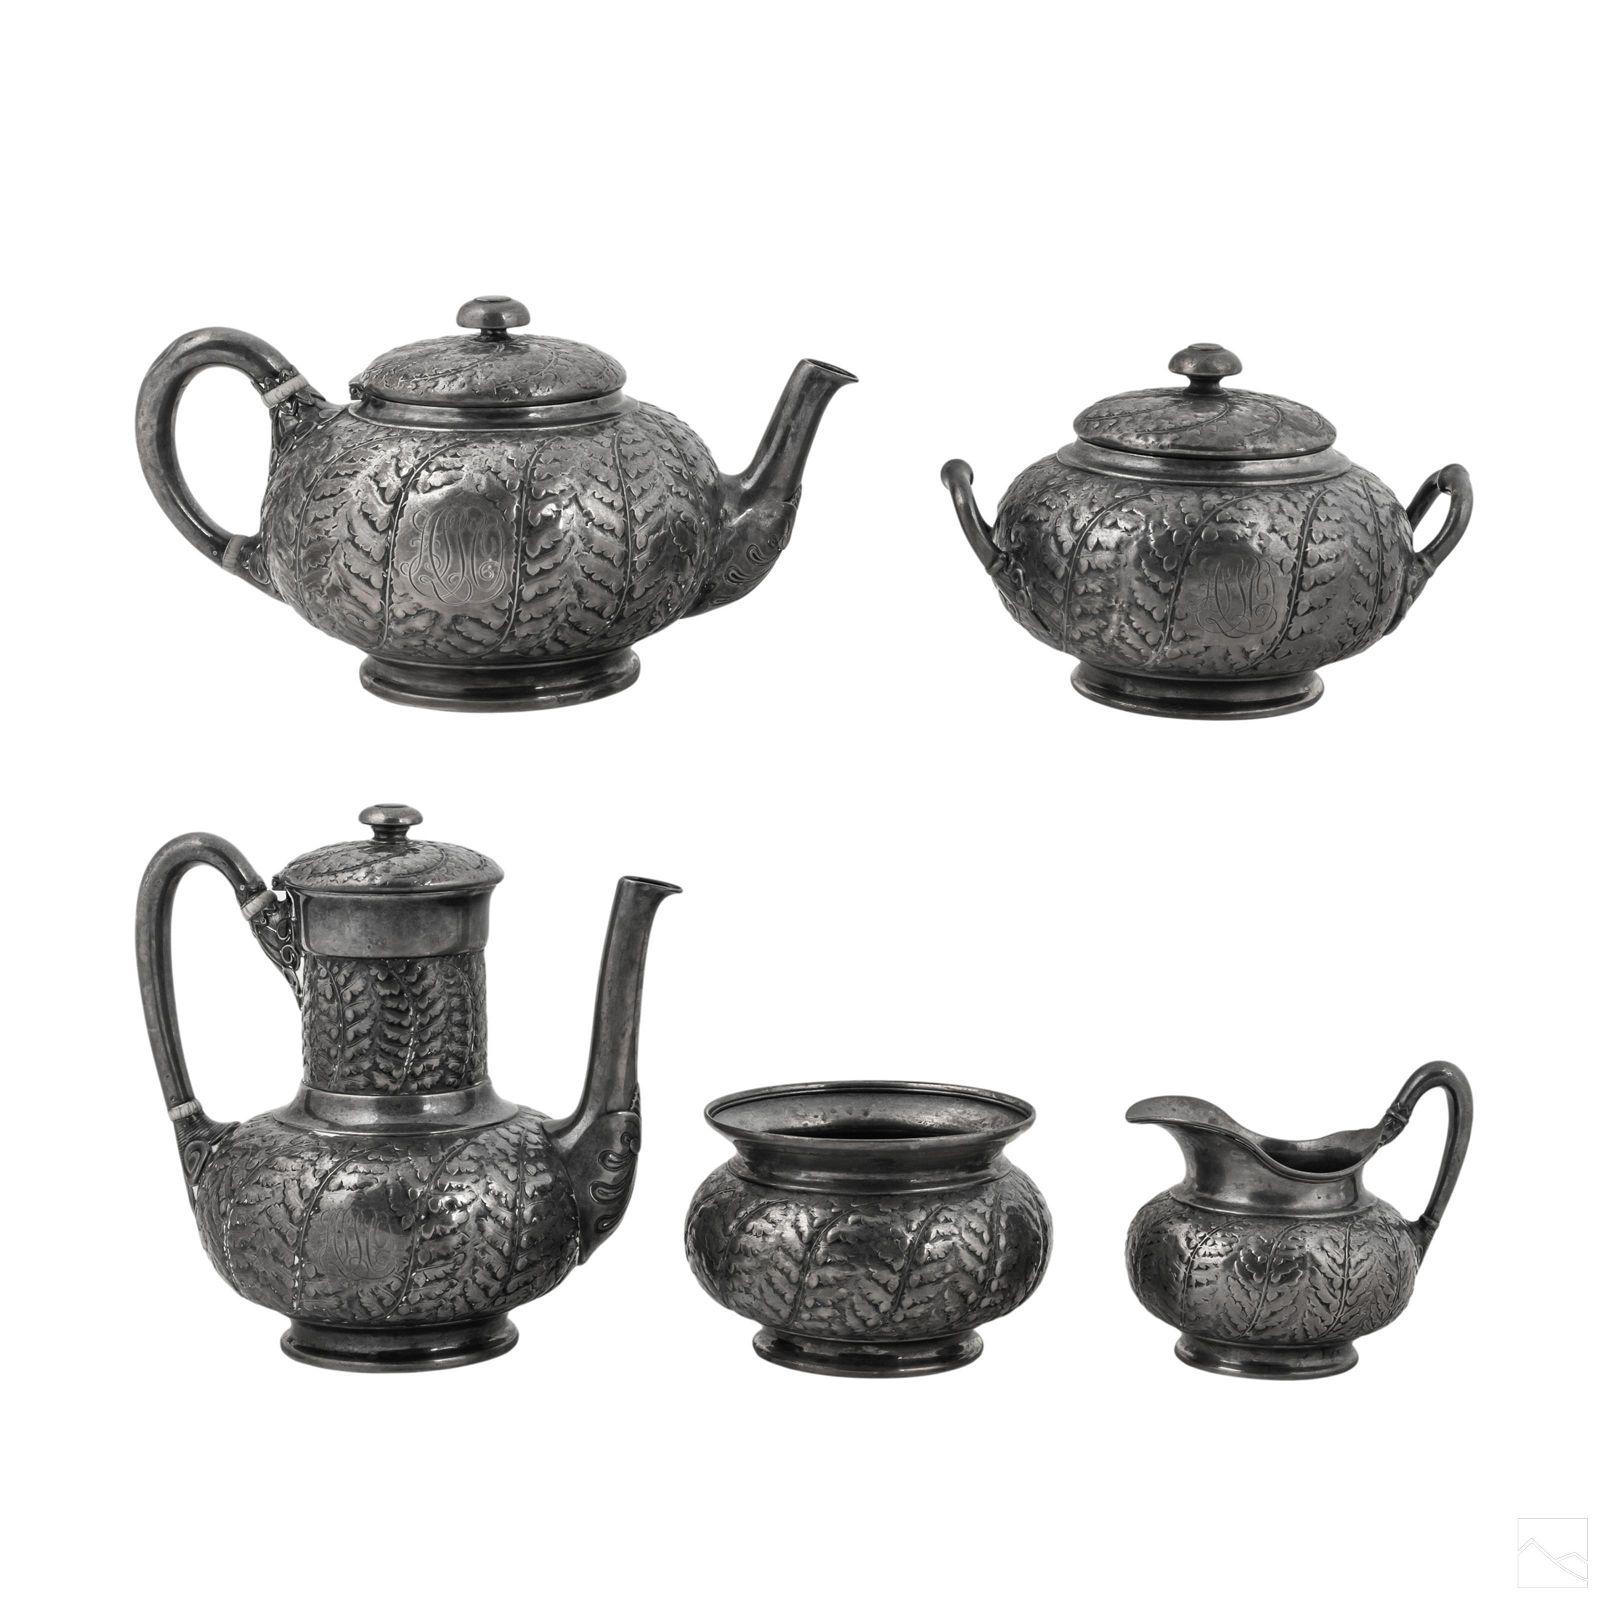 Tiffany & Co. Sterling Silver Tea Coffee Set 2478g